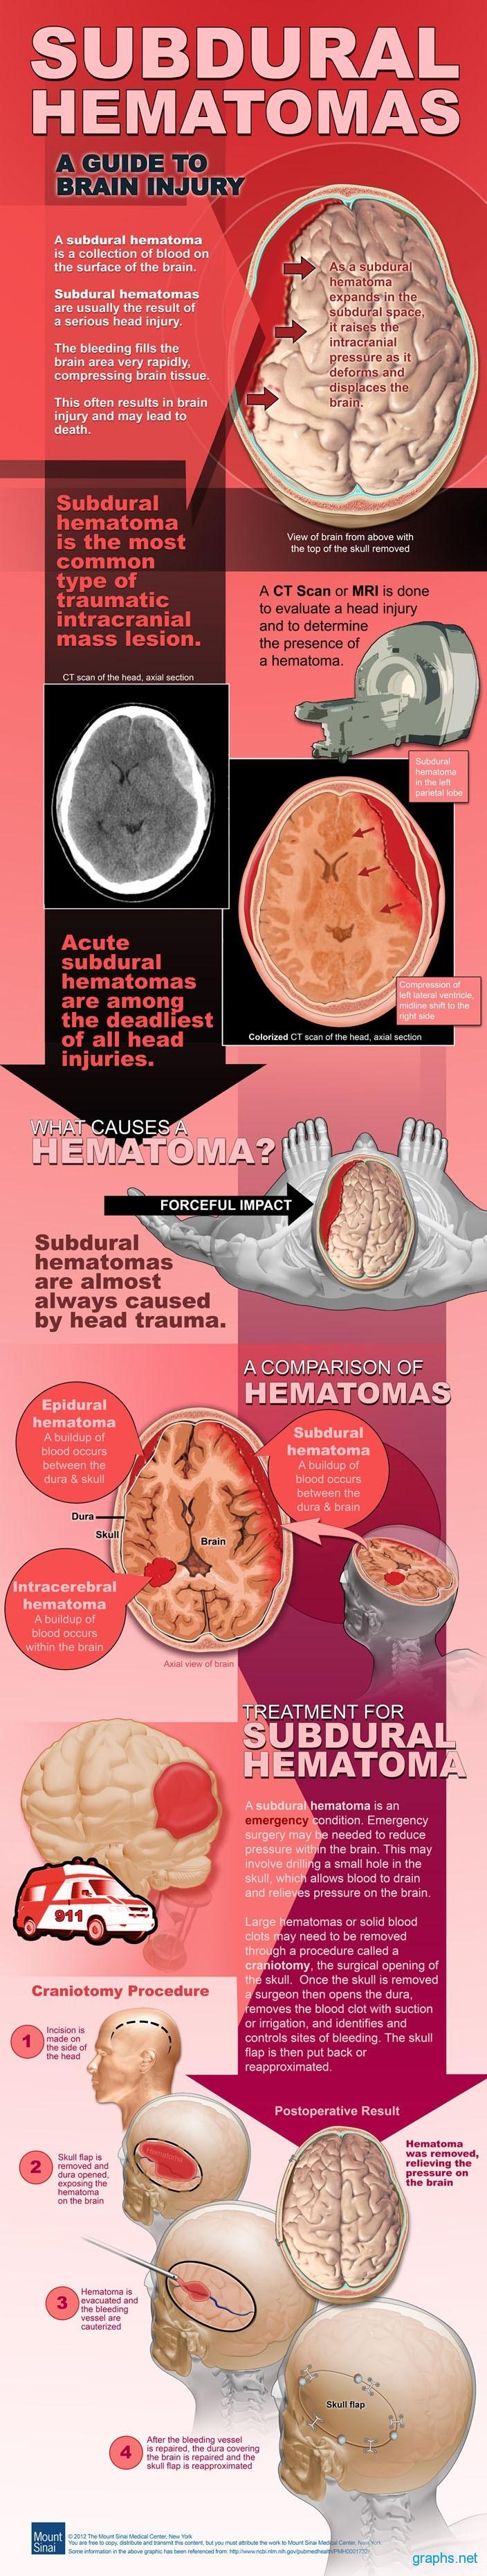 Subdural Hematoma Causes and Treatment